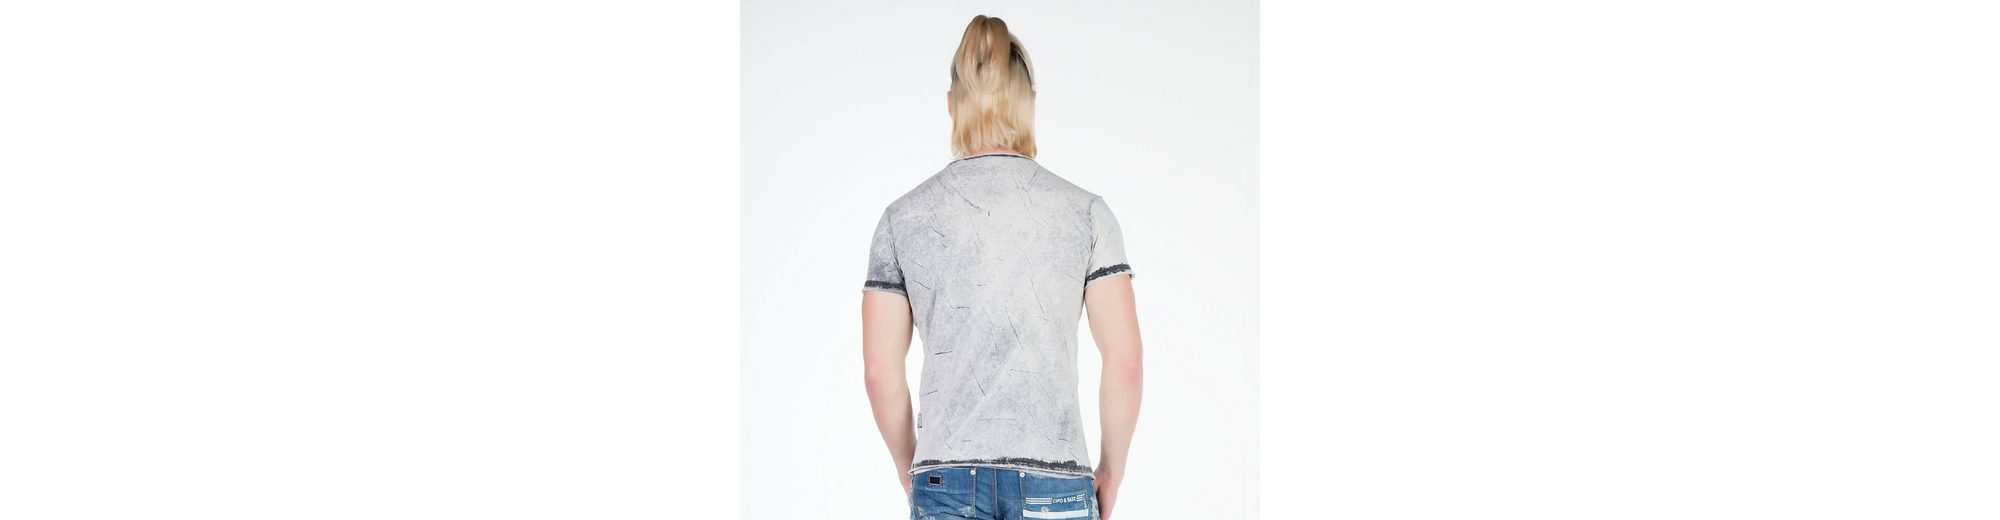 Cipo & Baxx Herren T-Shirt 2018 Rabatt 1zfsn